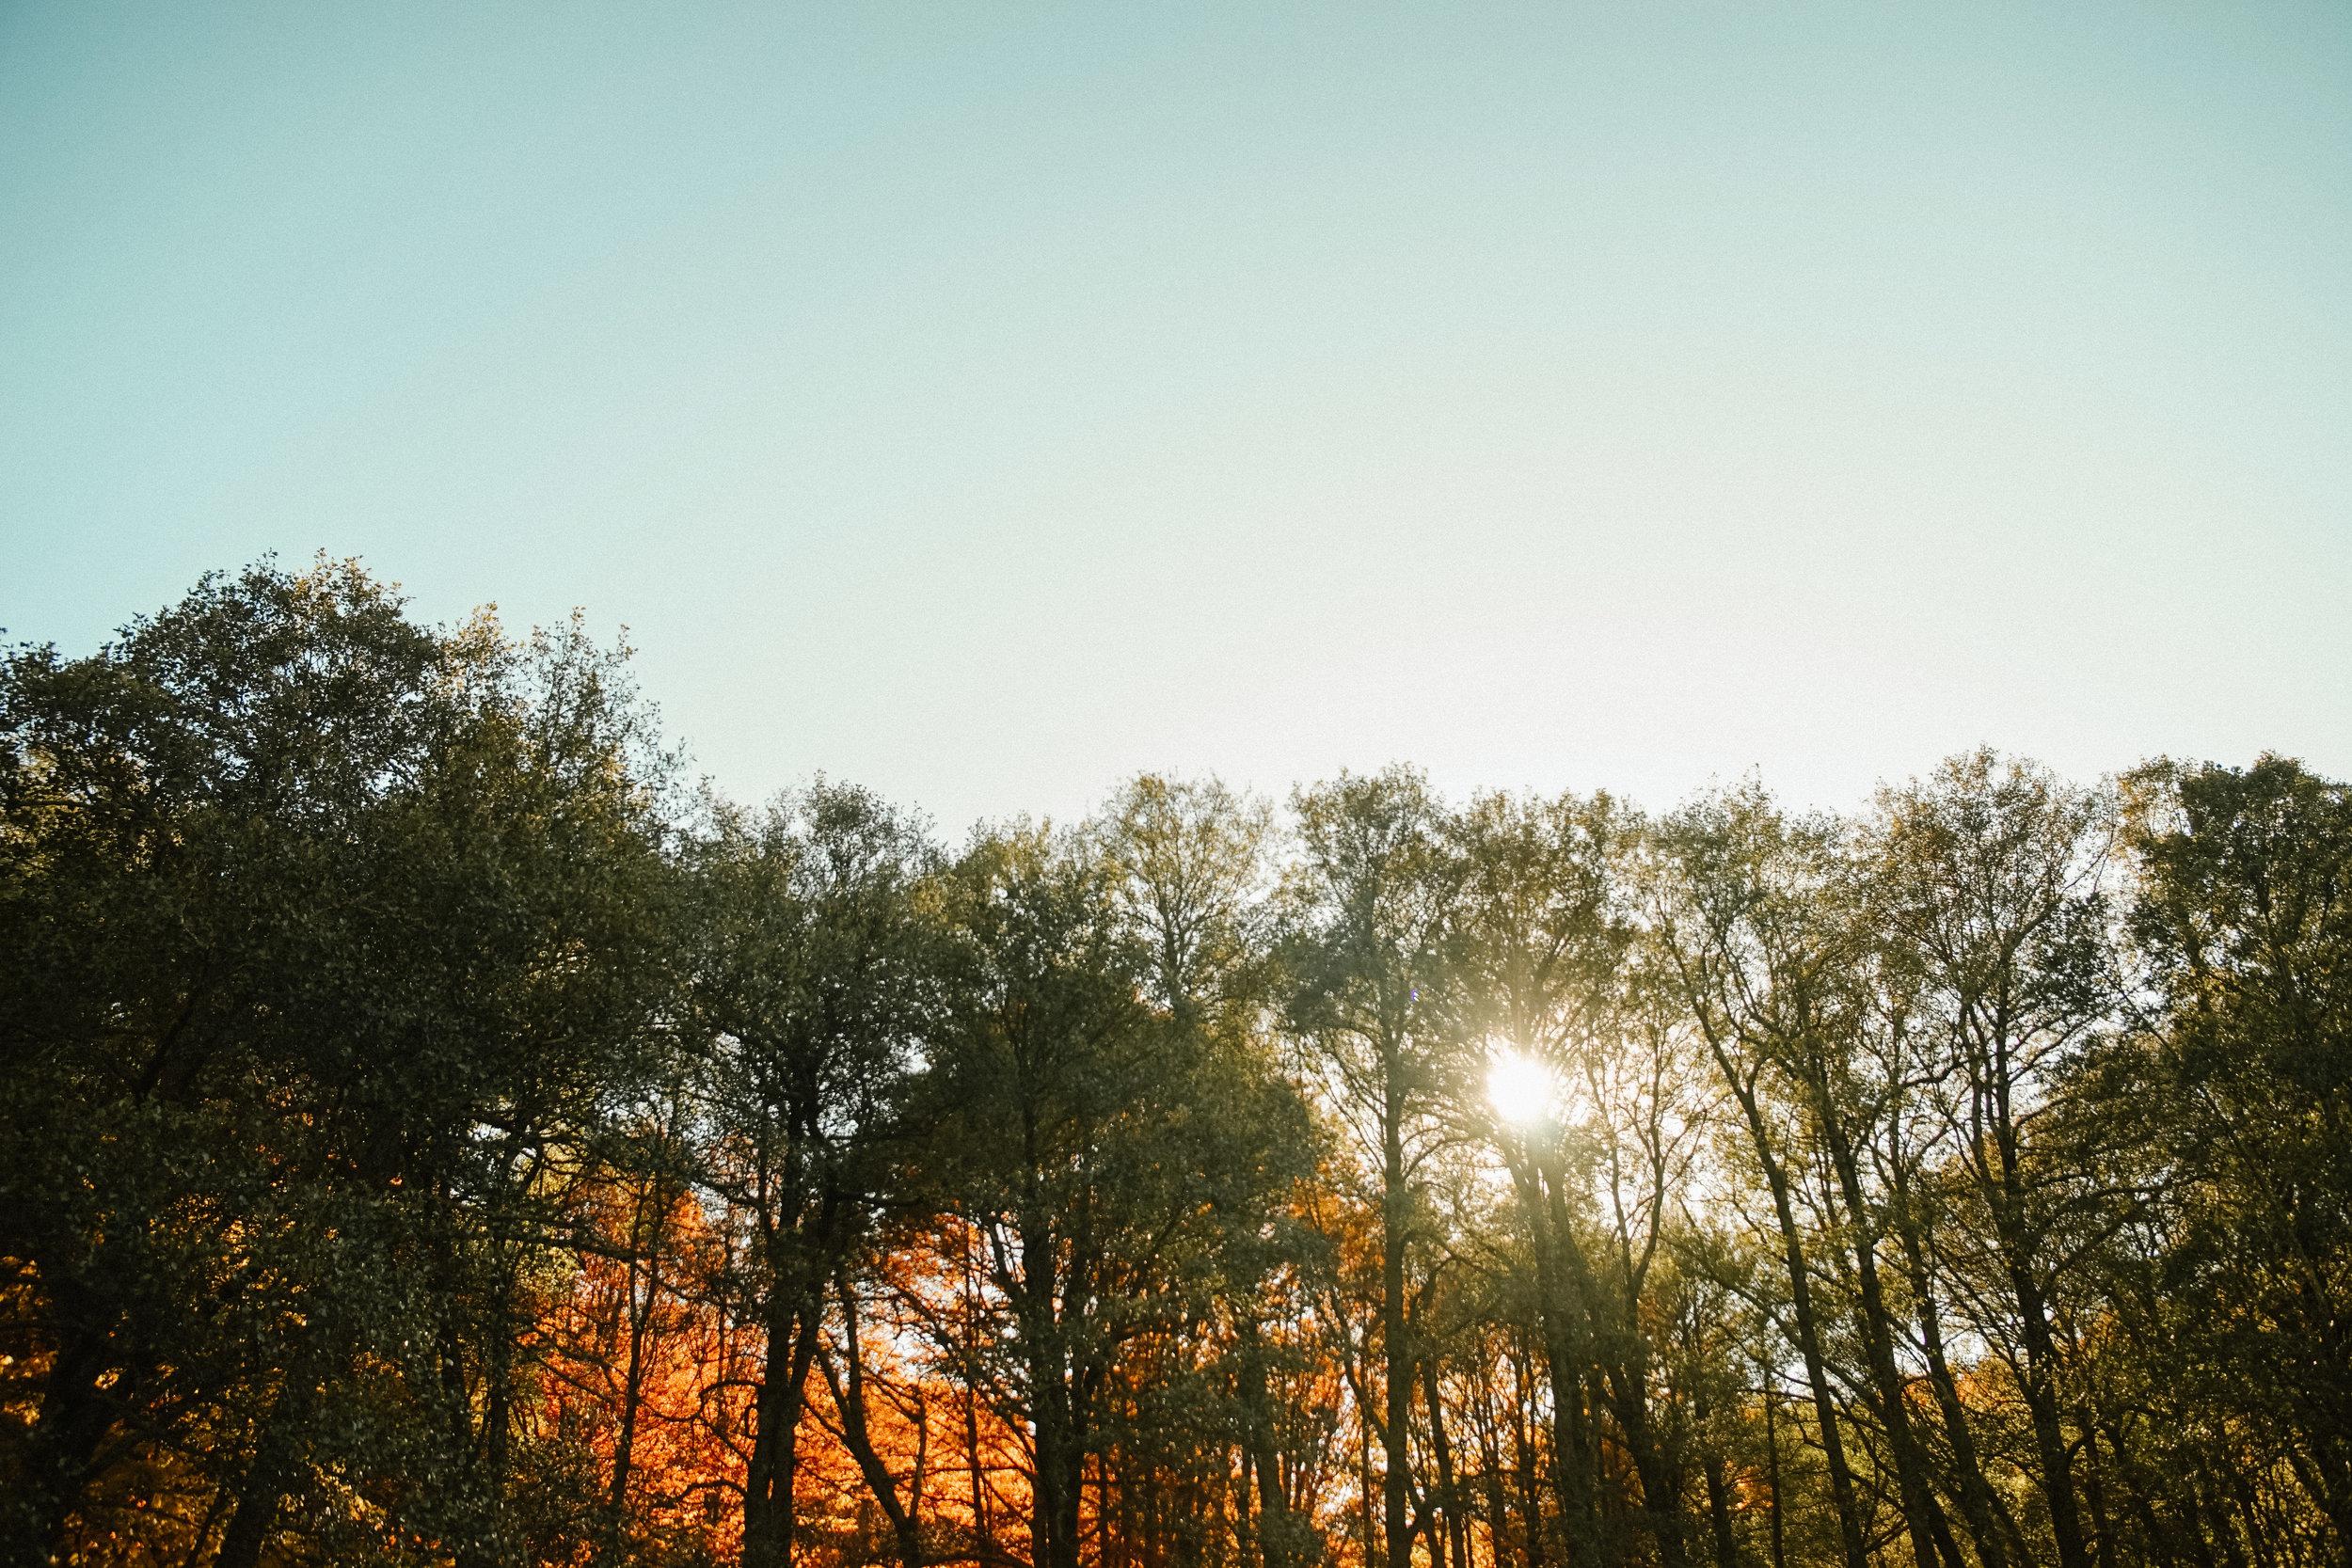 preboda-en-otoño-50.jpg